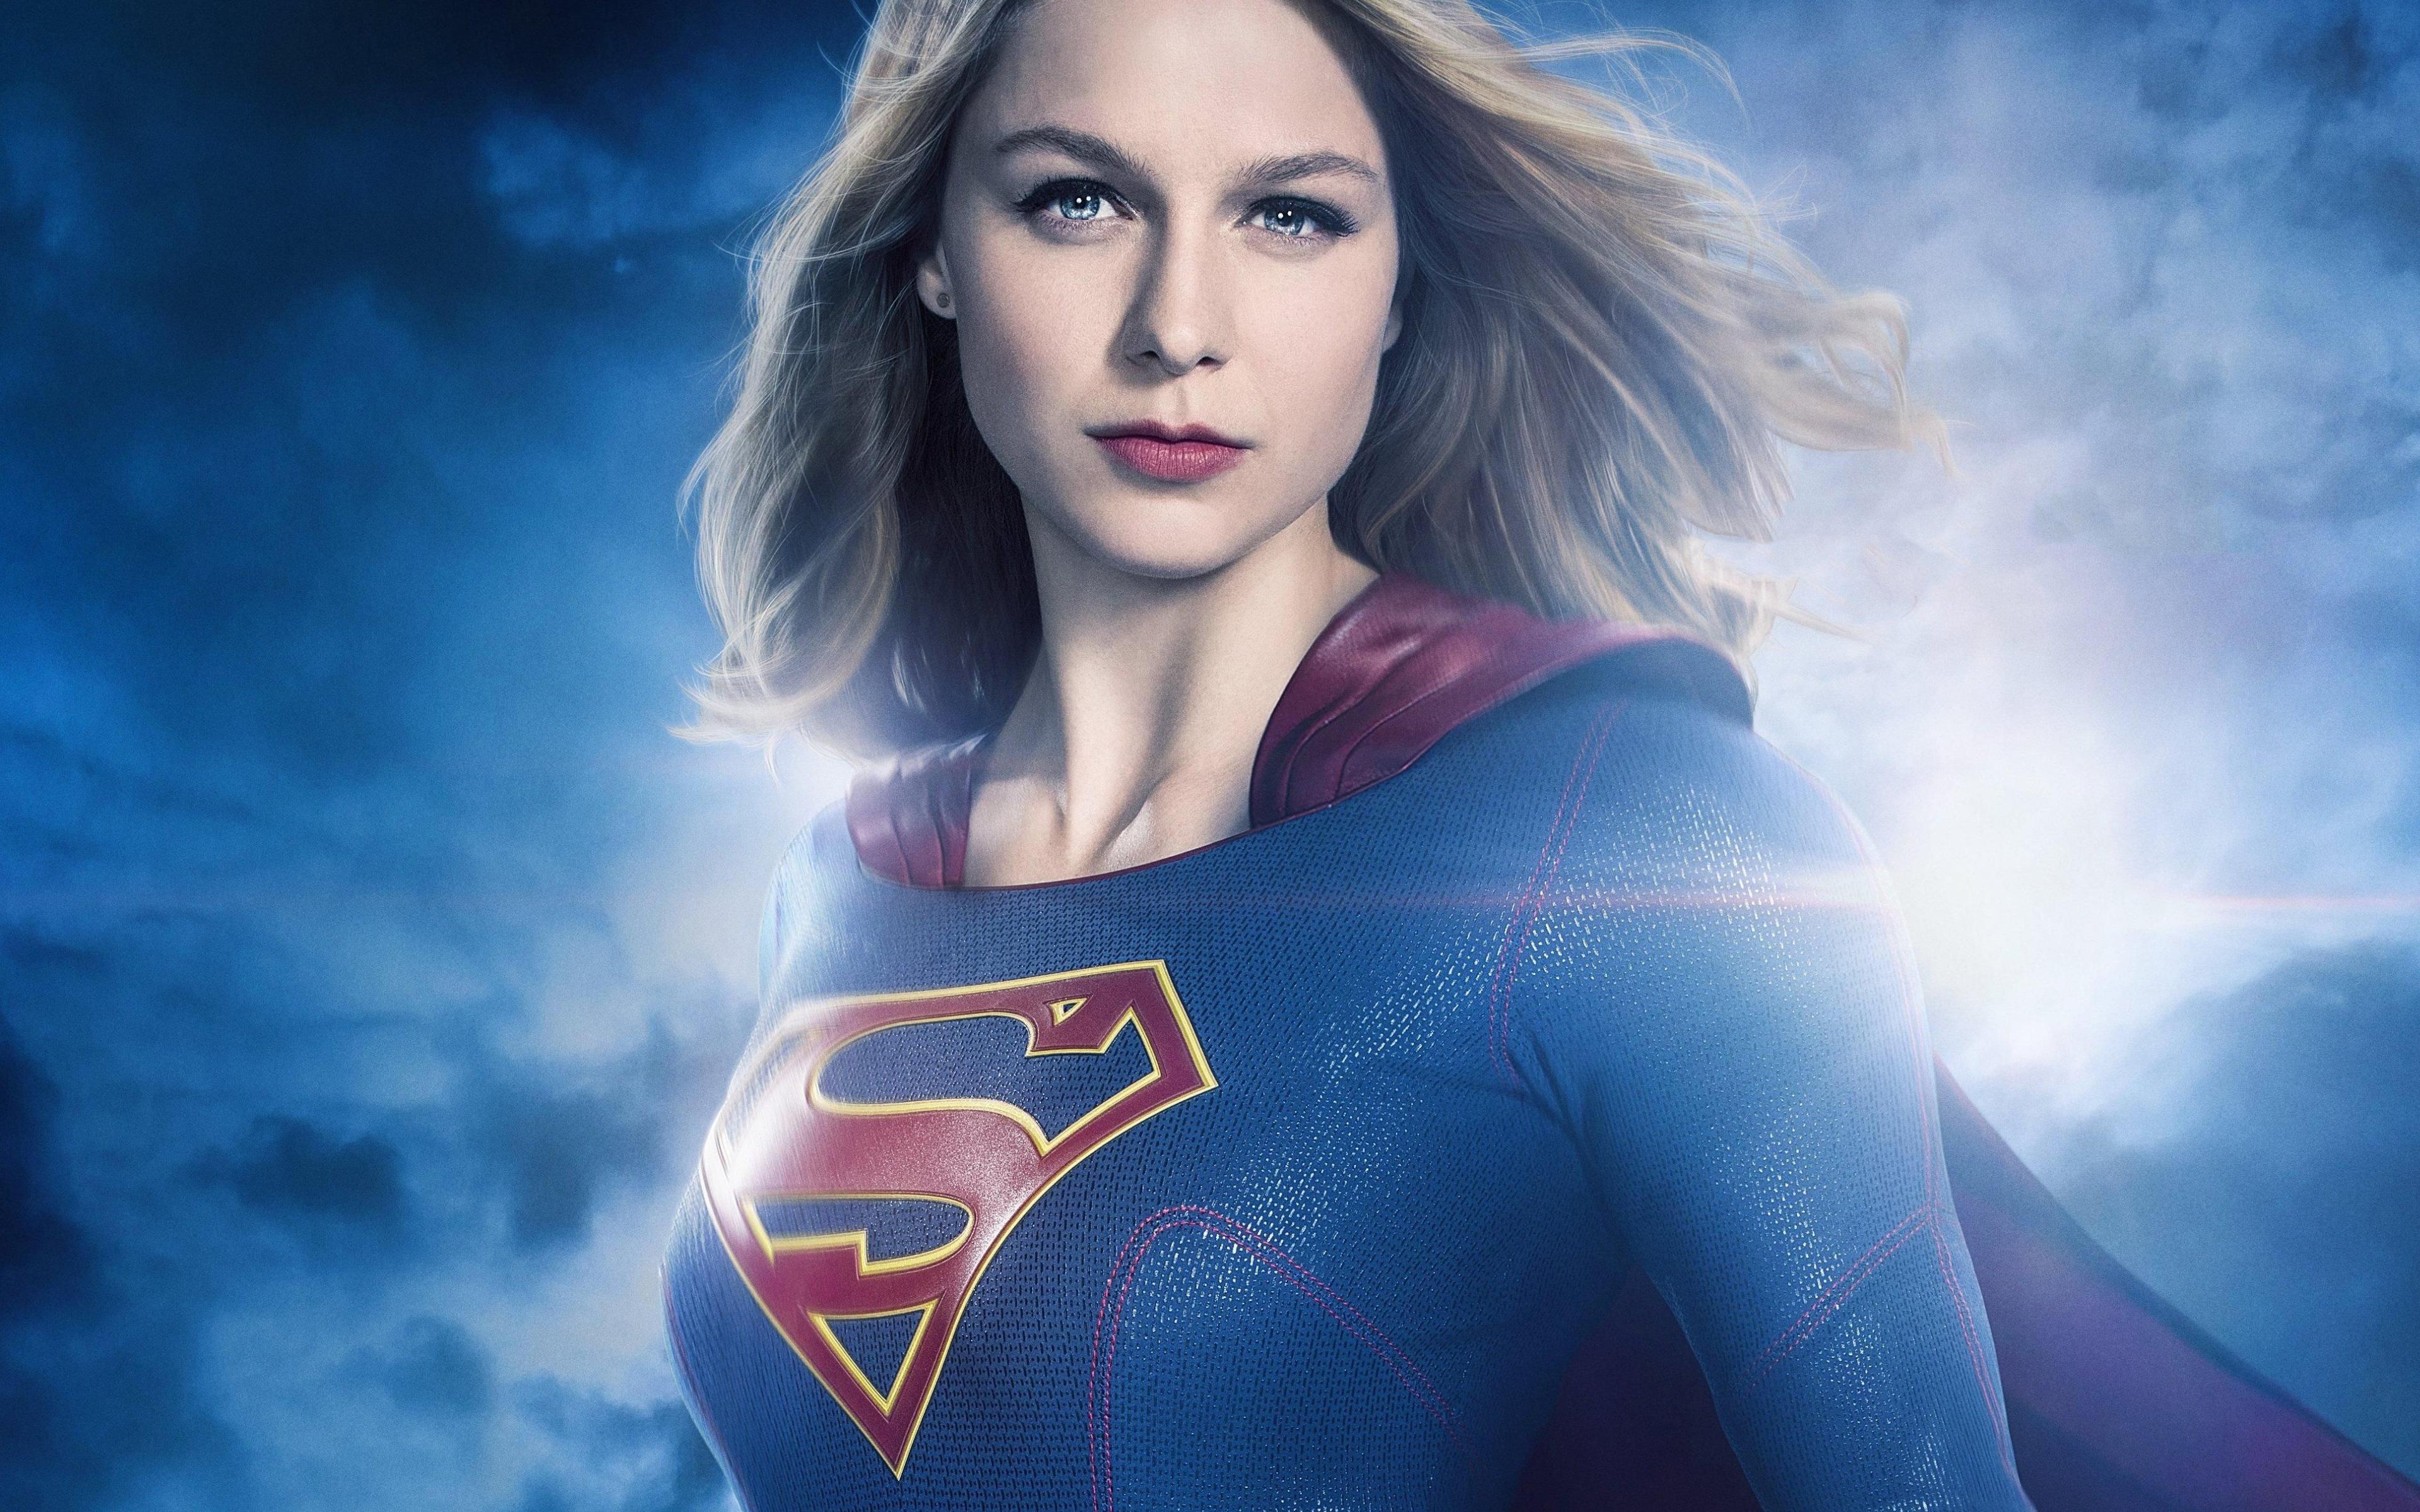 Melissa Gorga 4k Wallpapers: 3840x2400 Supergirl Season 3 4k 4k HD 4k Wallpapers